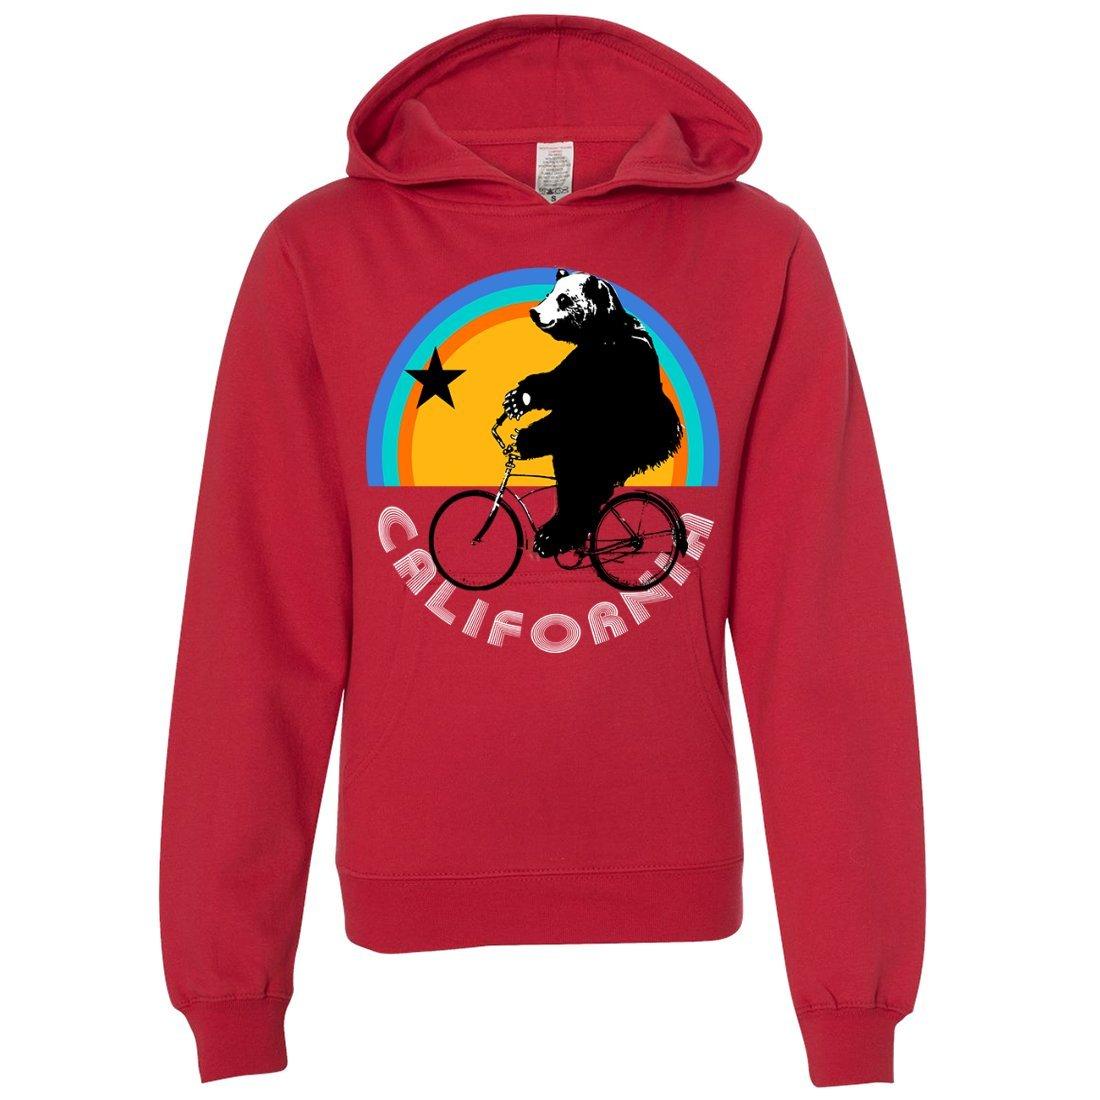 California Bear On Bike Youth Sweatshirt Hoodie Dolphin Shirt Co